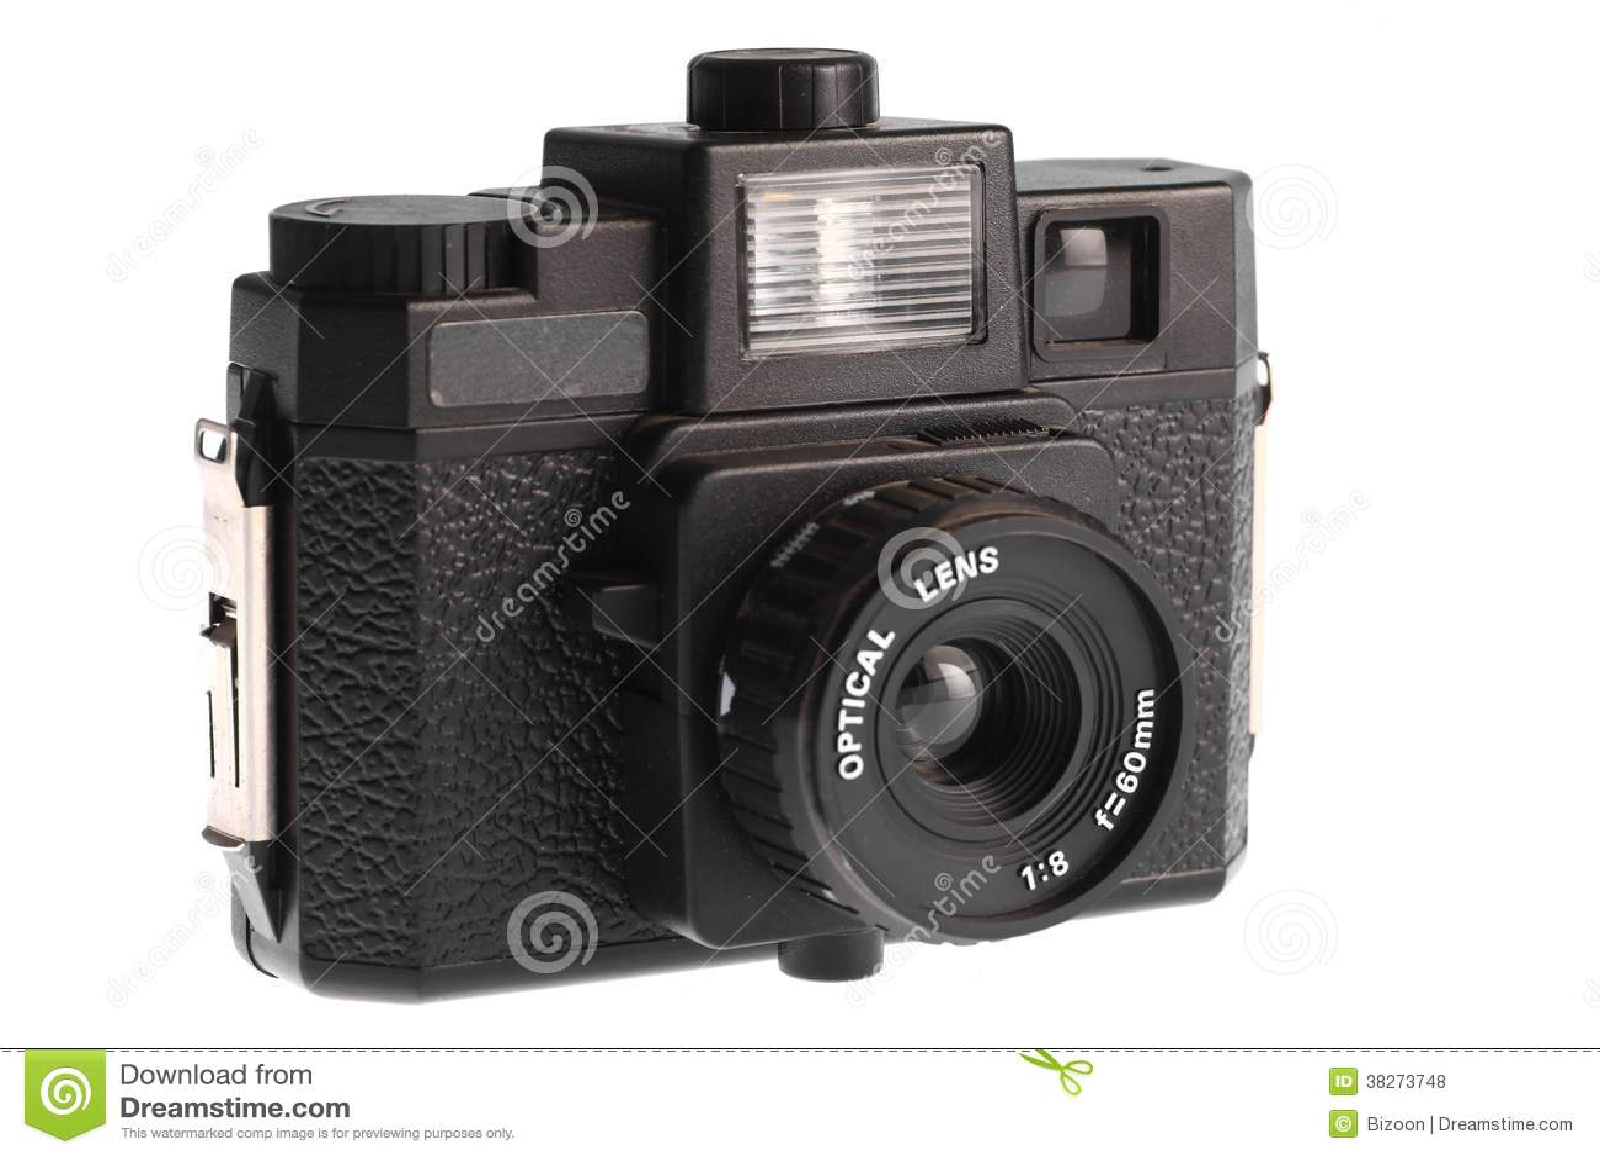 appareil photo en plastique photo stock image du photo objet 38273748. Black Bedroom Furniture Sets. Home Design Ideas